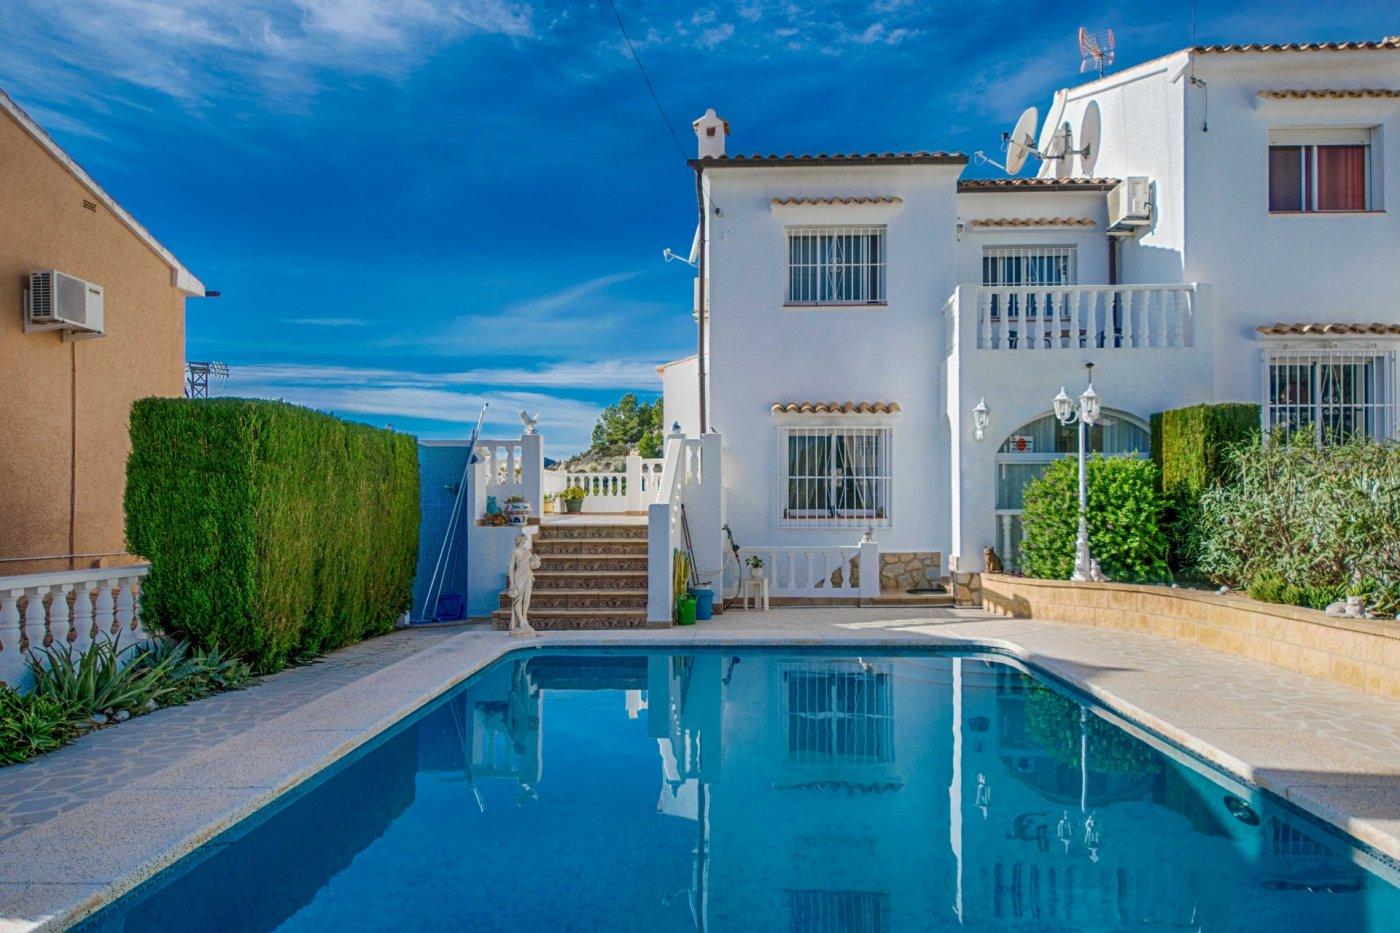 Real Estate Agents Altea - Properties for sale in Altea - townhouse - alfas-del-pi